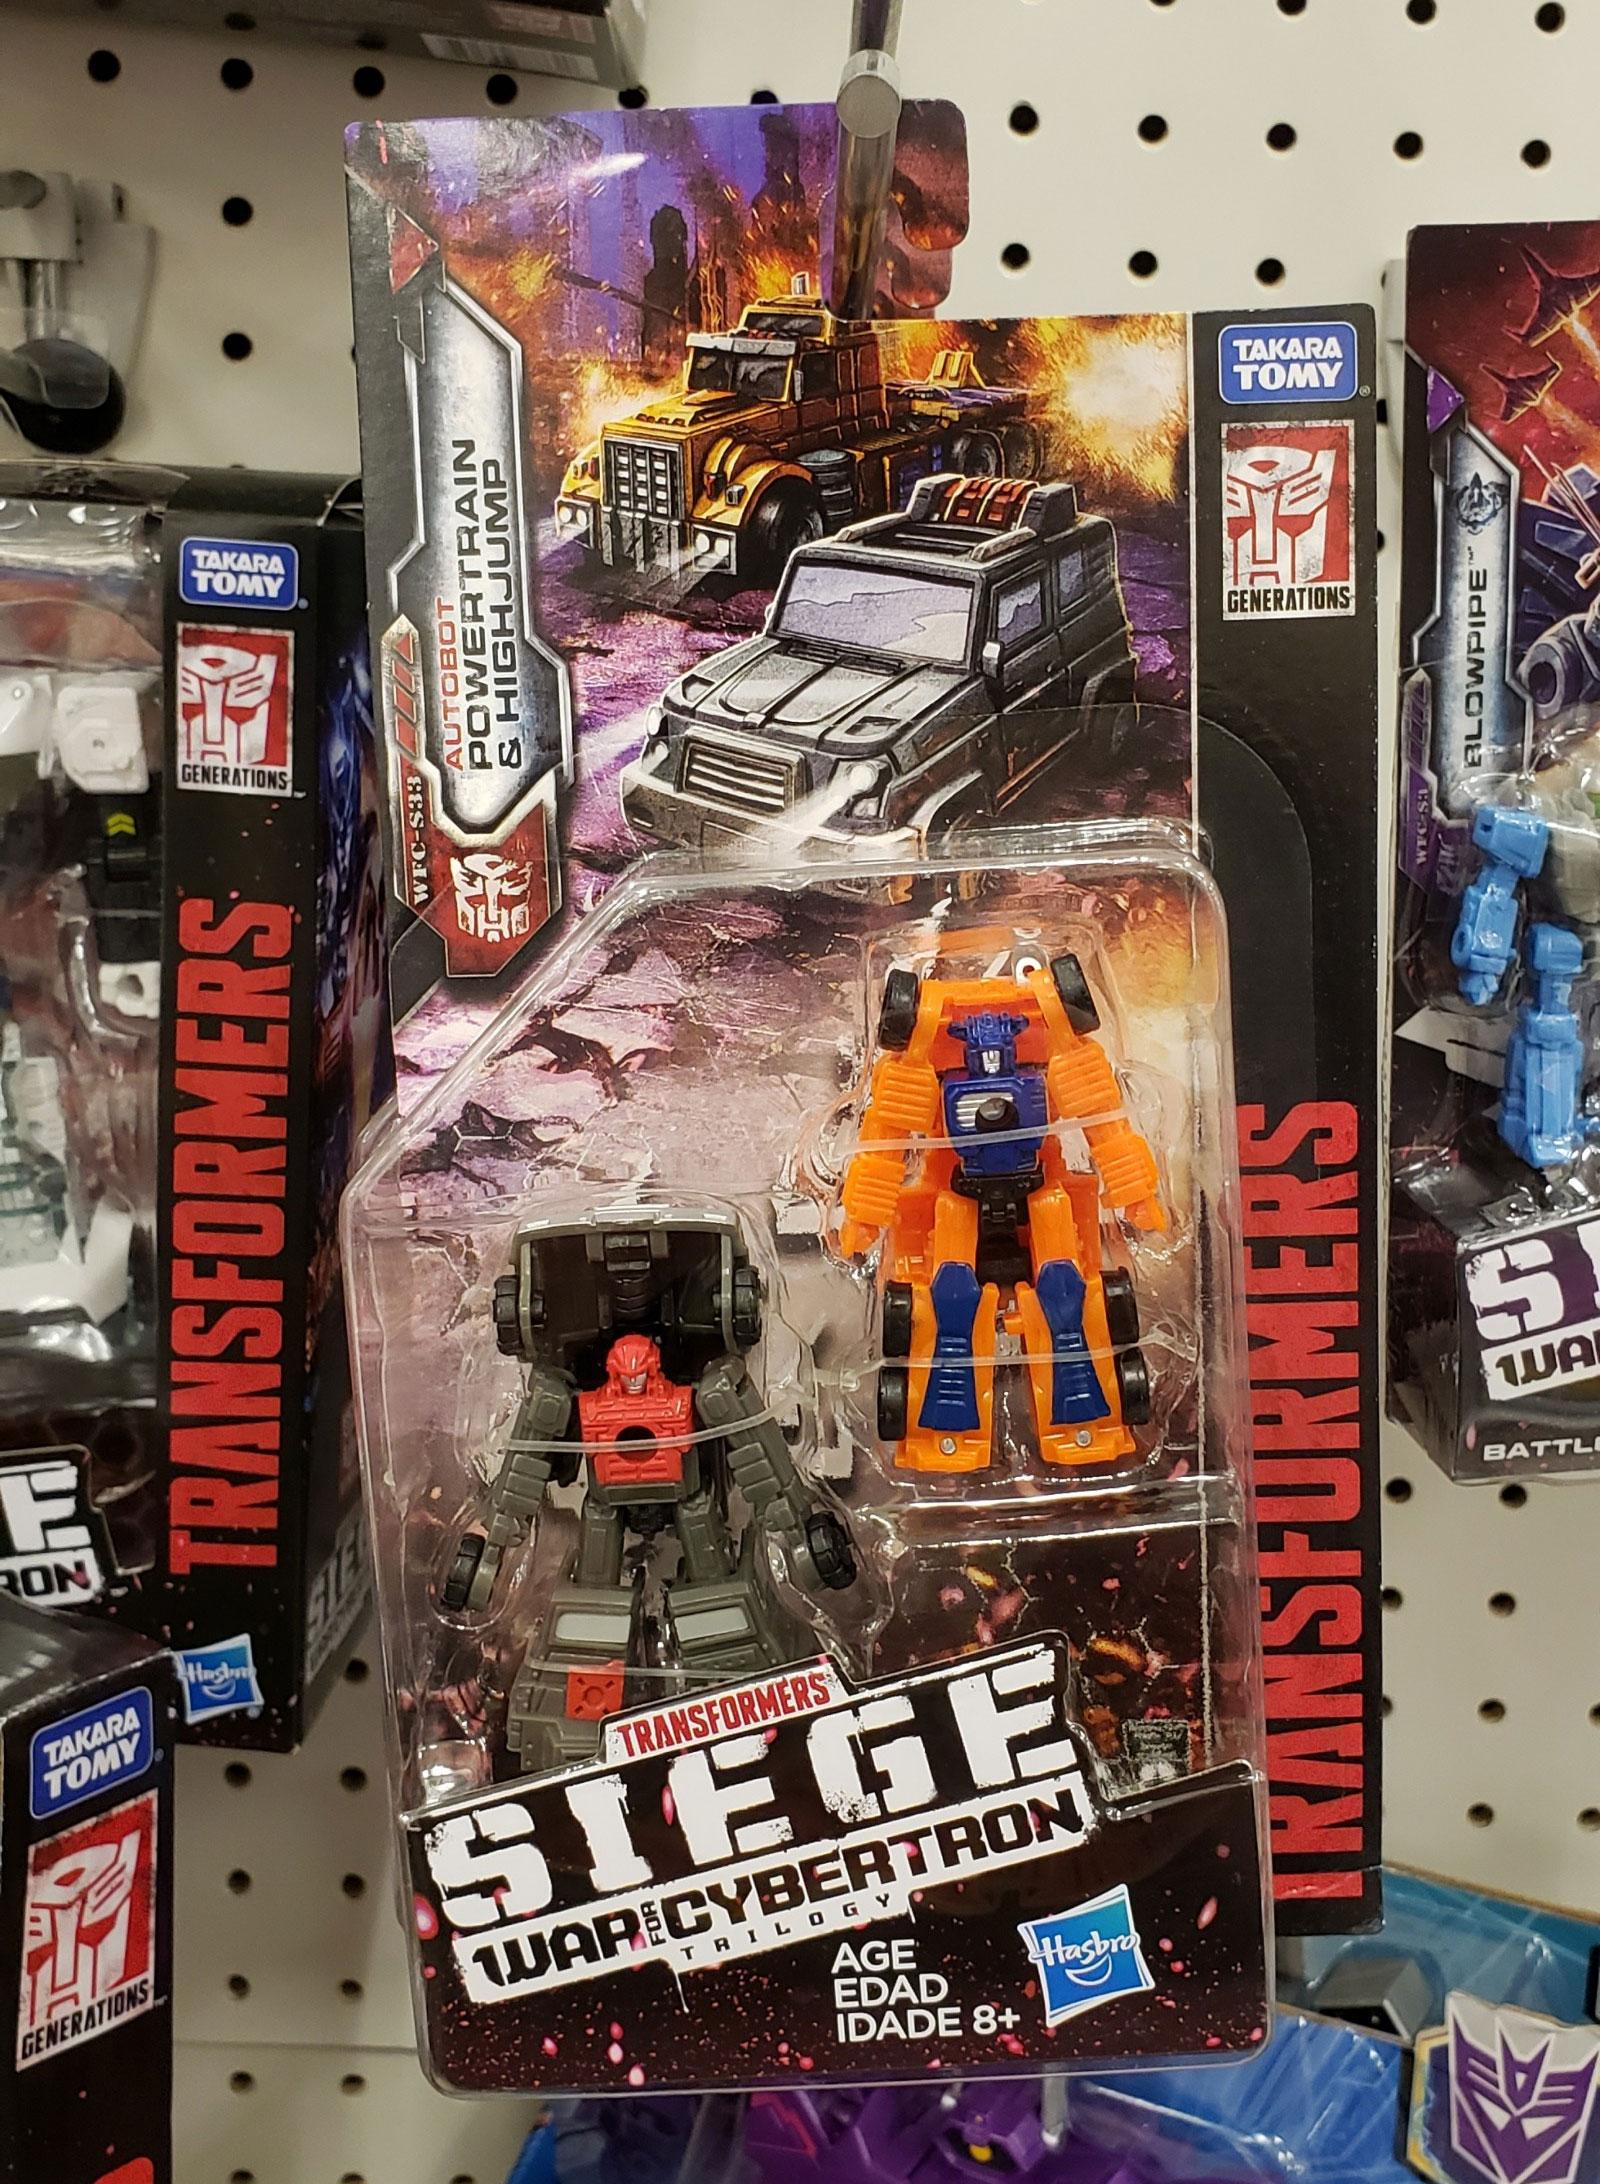 HighJump Transformer Generation 1 G1 Autobot figura OFF ROAD Patrol